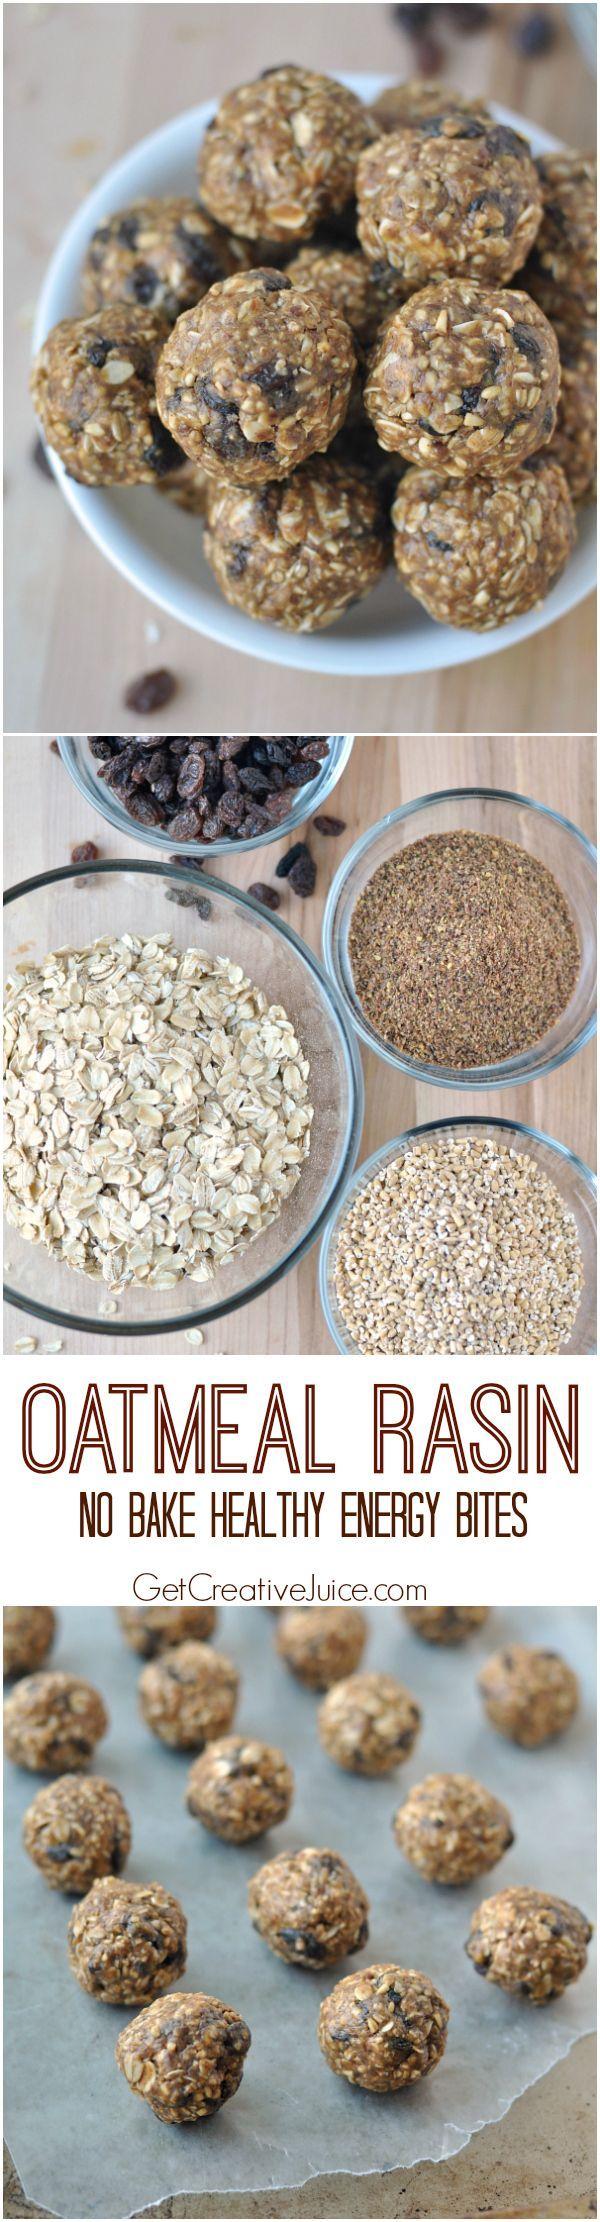 Oatmeal Raisin Energy Bites - No Bake & Healthy recipe!  #bake #holidaytable #recipe